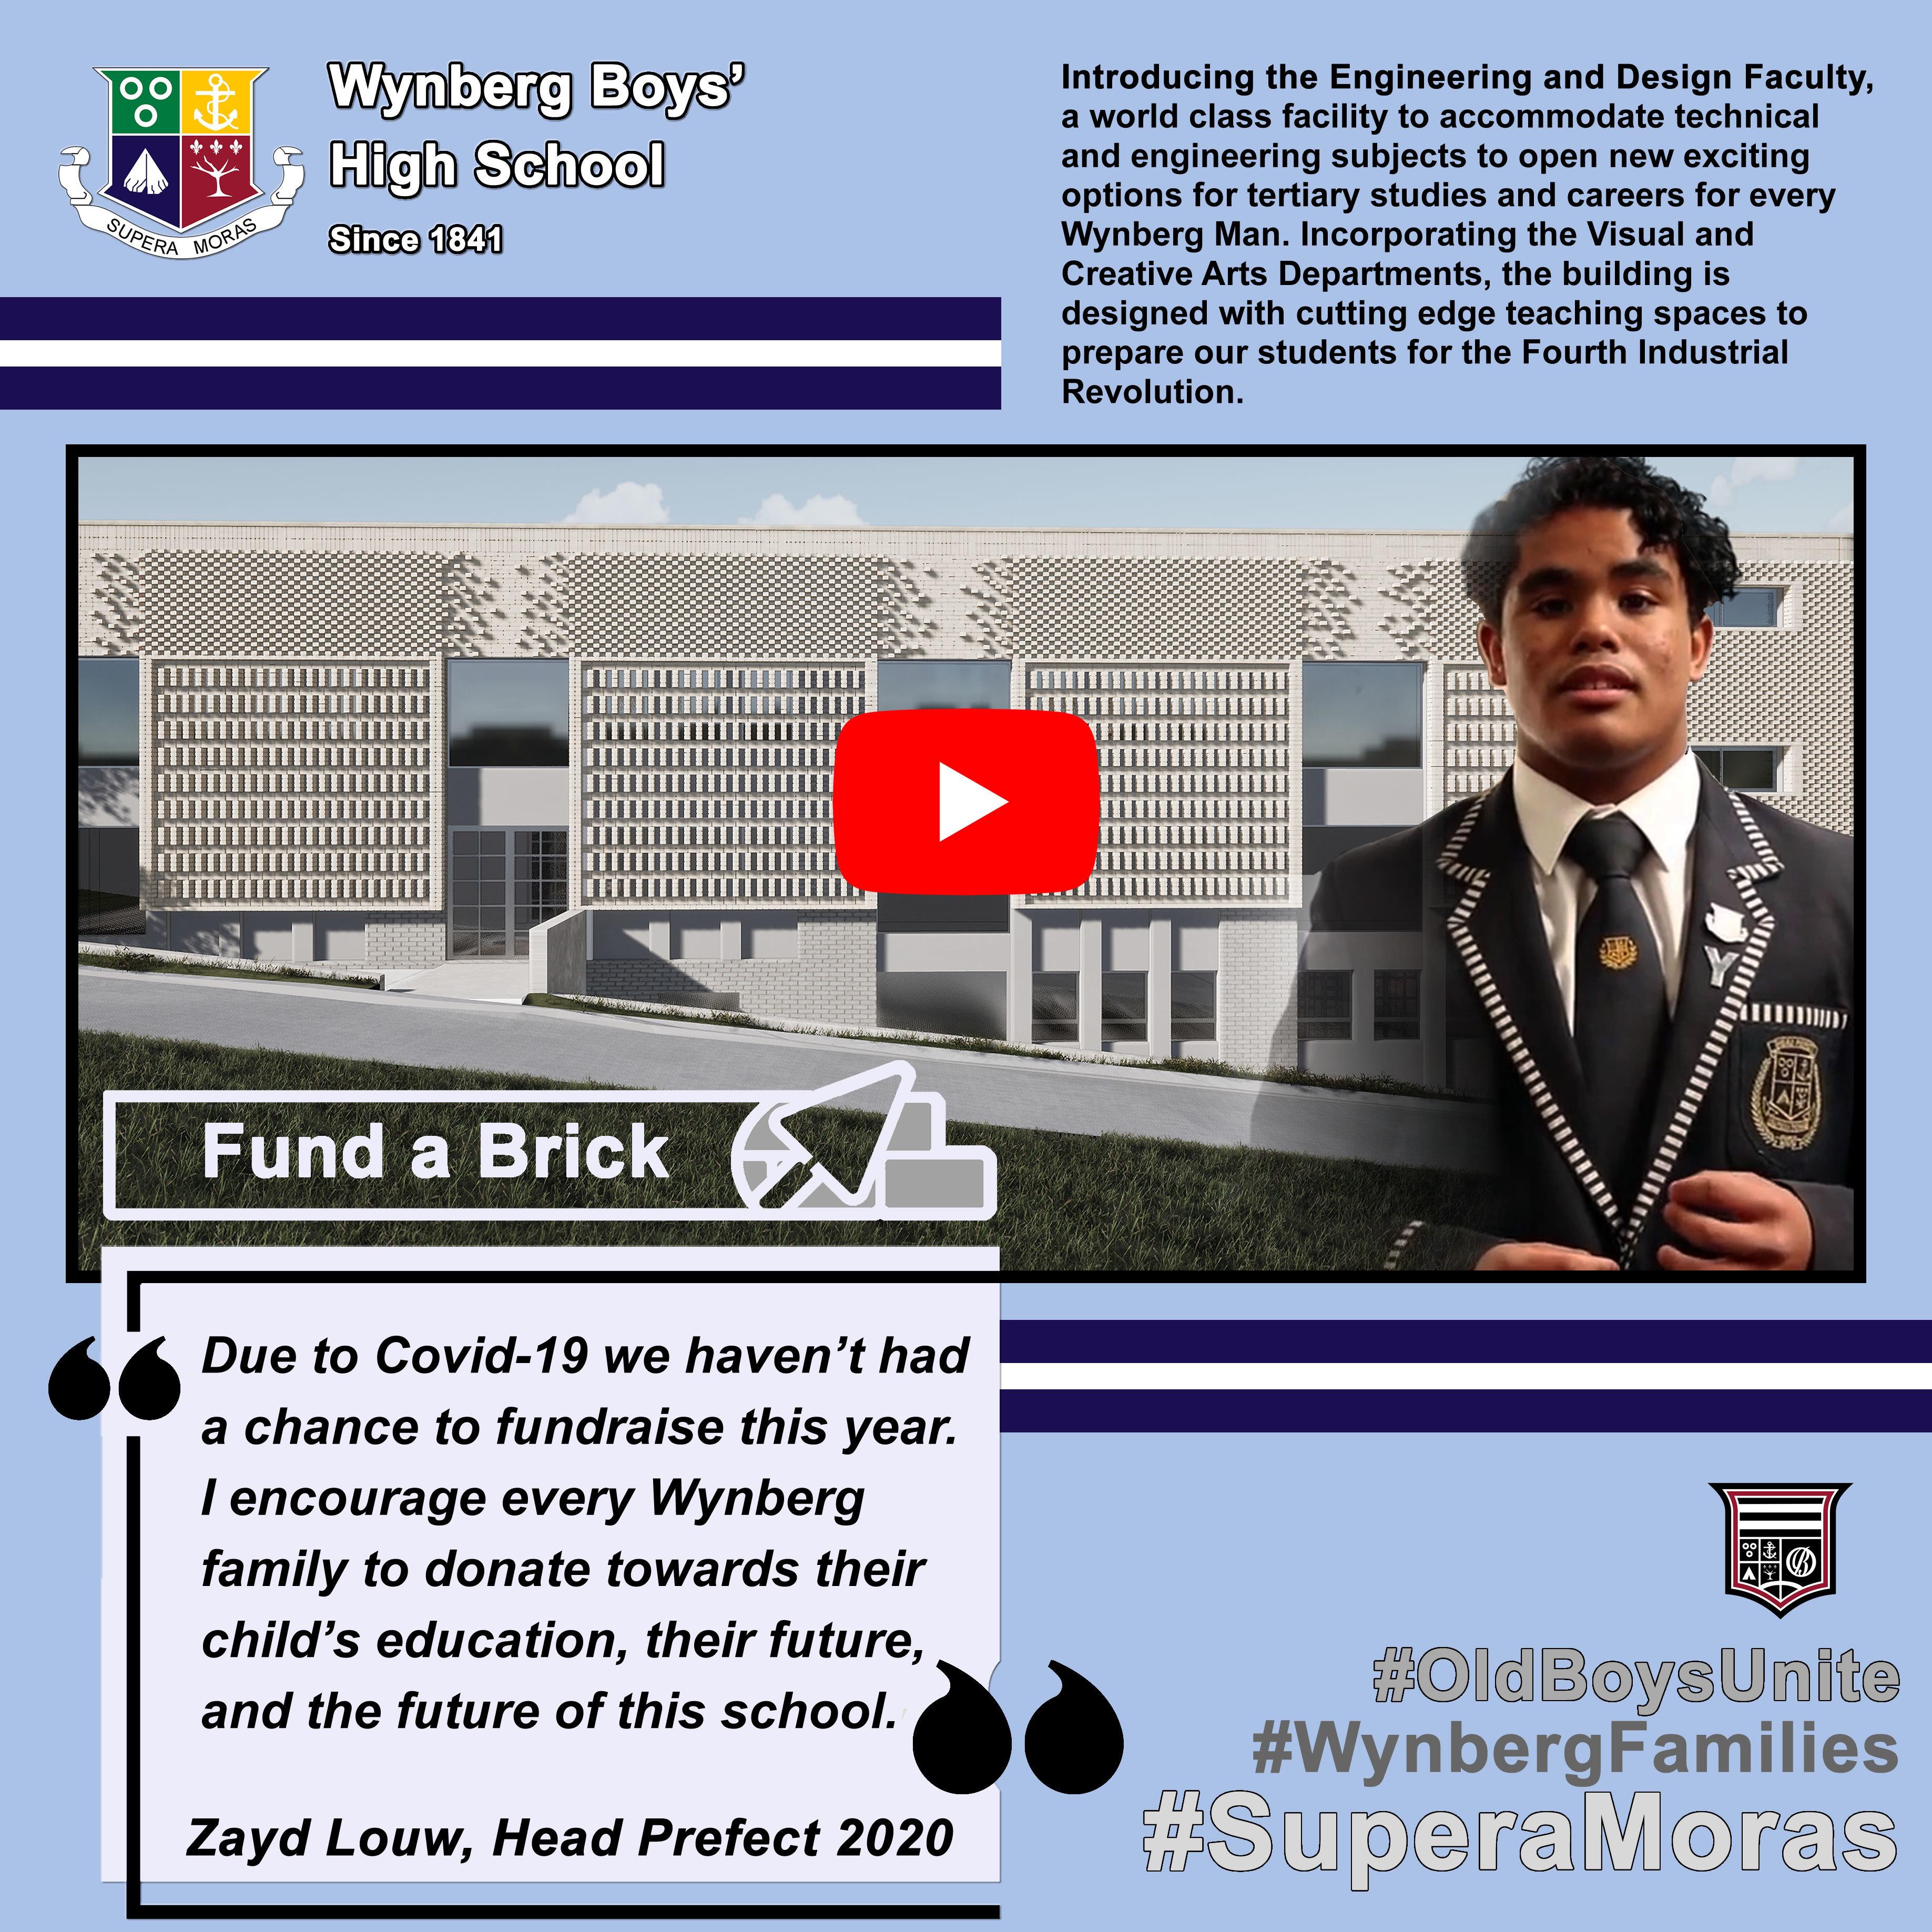 Fund a Brick: Zayd Louw